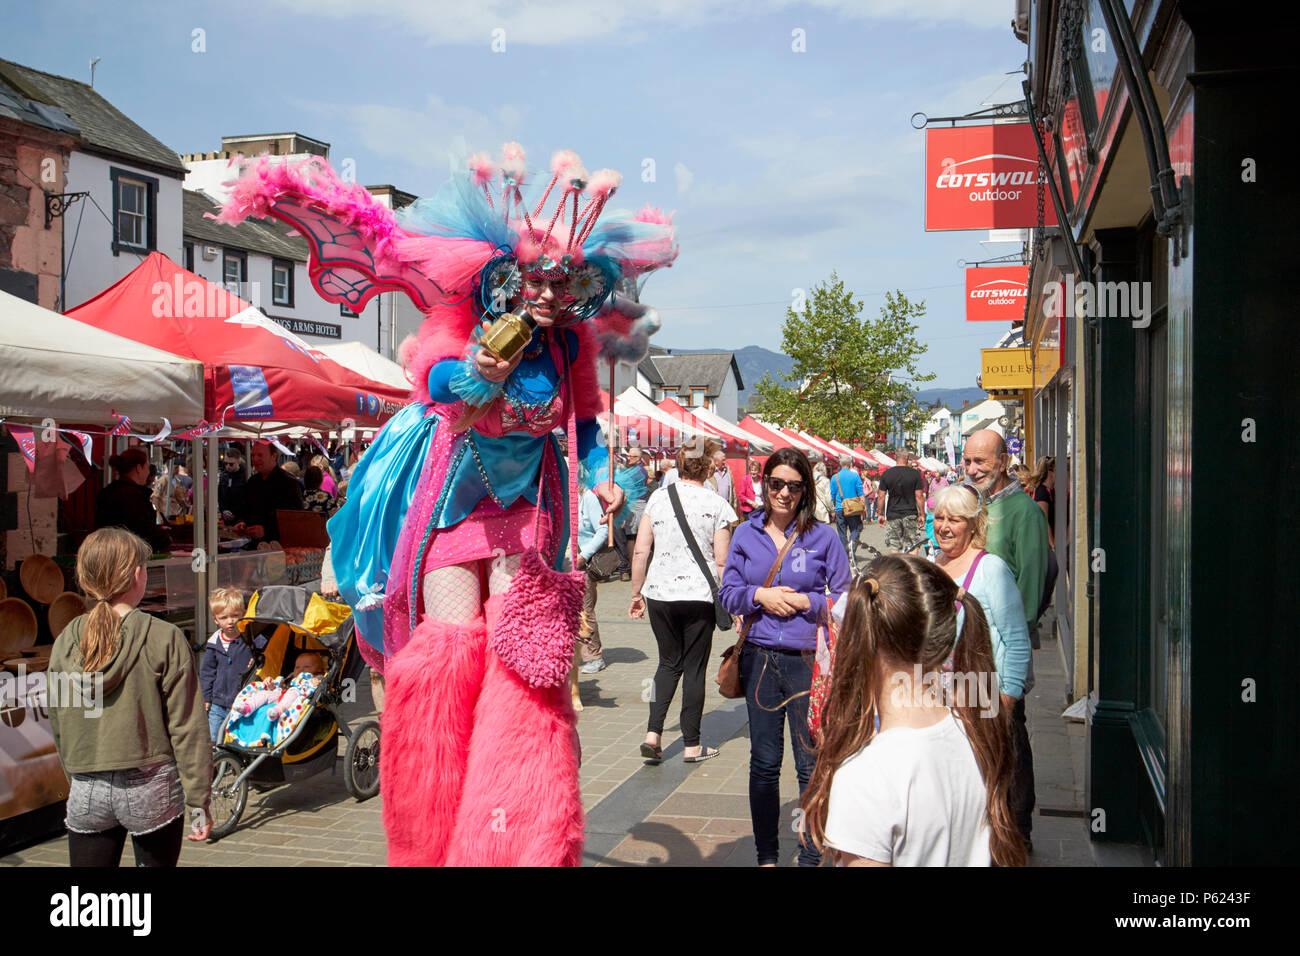 street entertainer entertaining children at Keswick market on main street Lake District Cumbria England UK - Stock Image